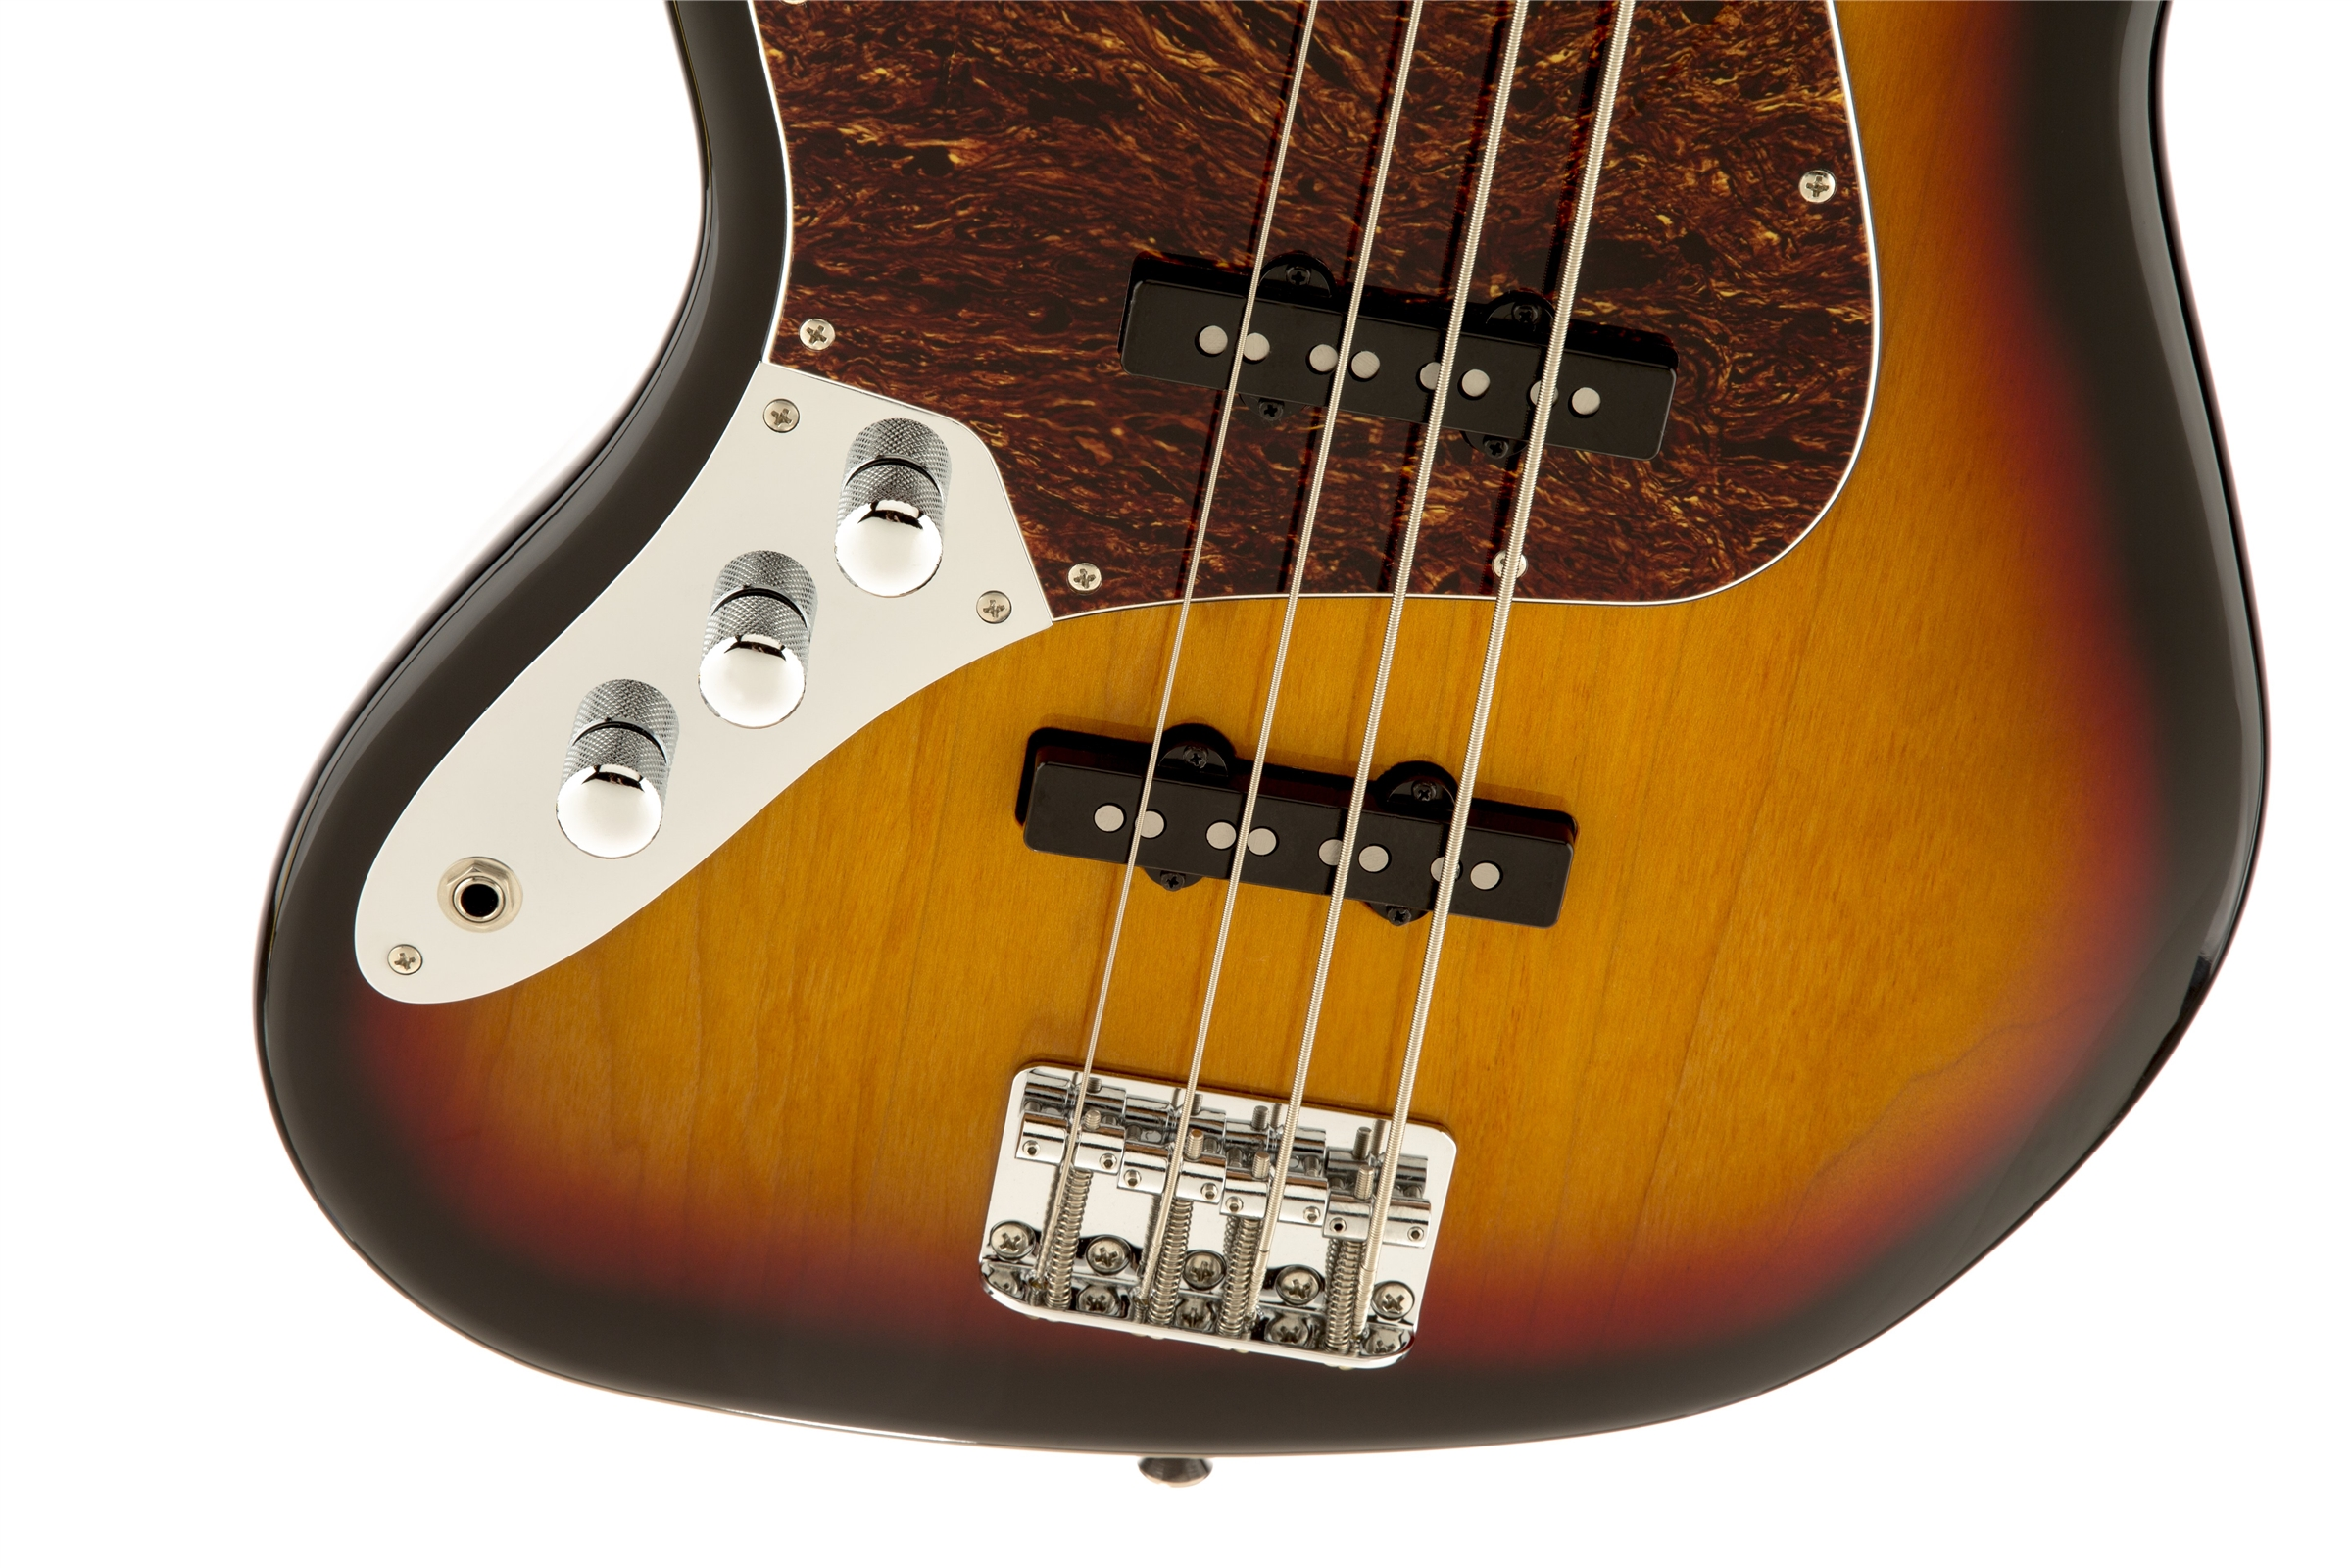 squier vintage modified jazz bass left handed squier bass guitars. Black Bedroom Furniture Sets. Home Design Ideas